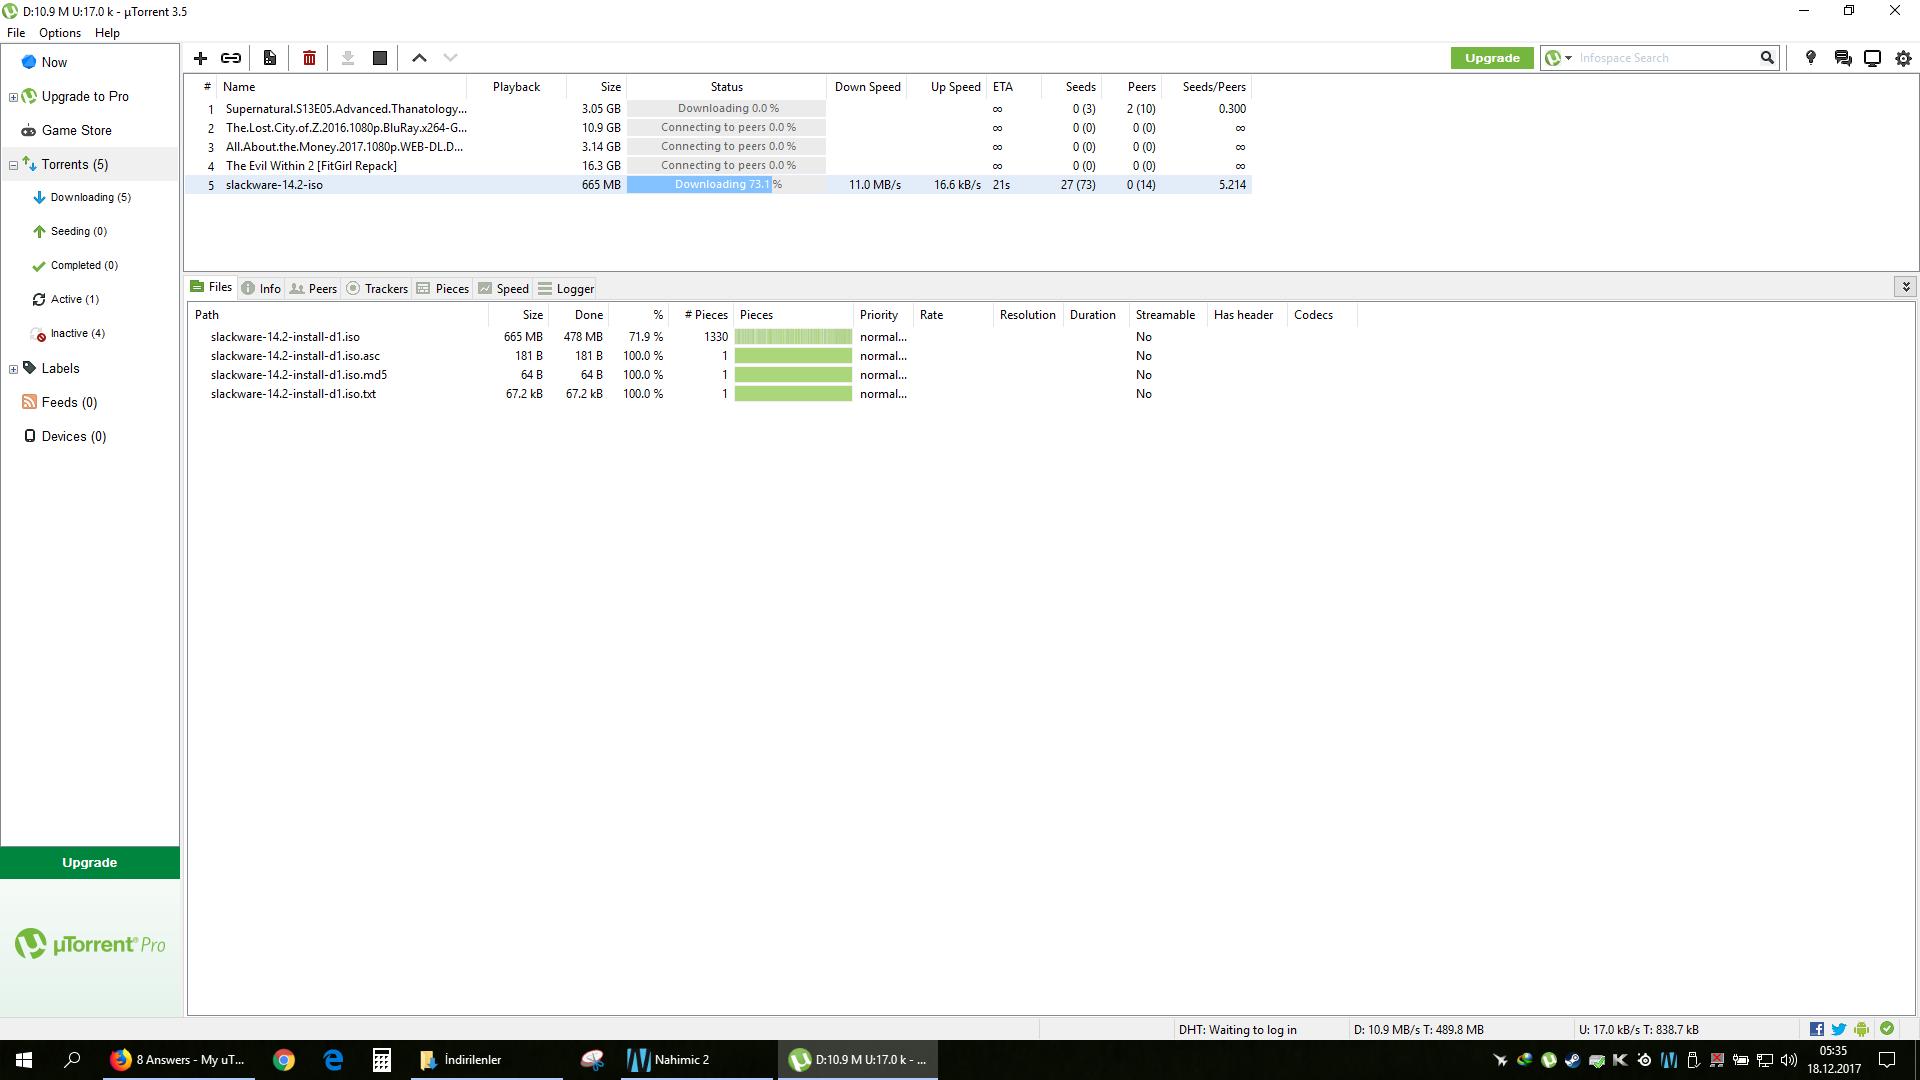 Can download slackware torrent but nothing else seems to